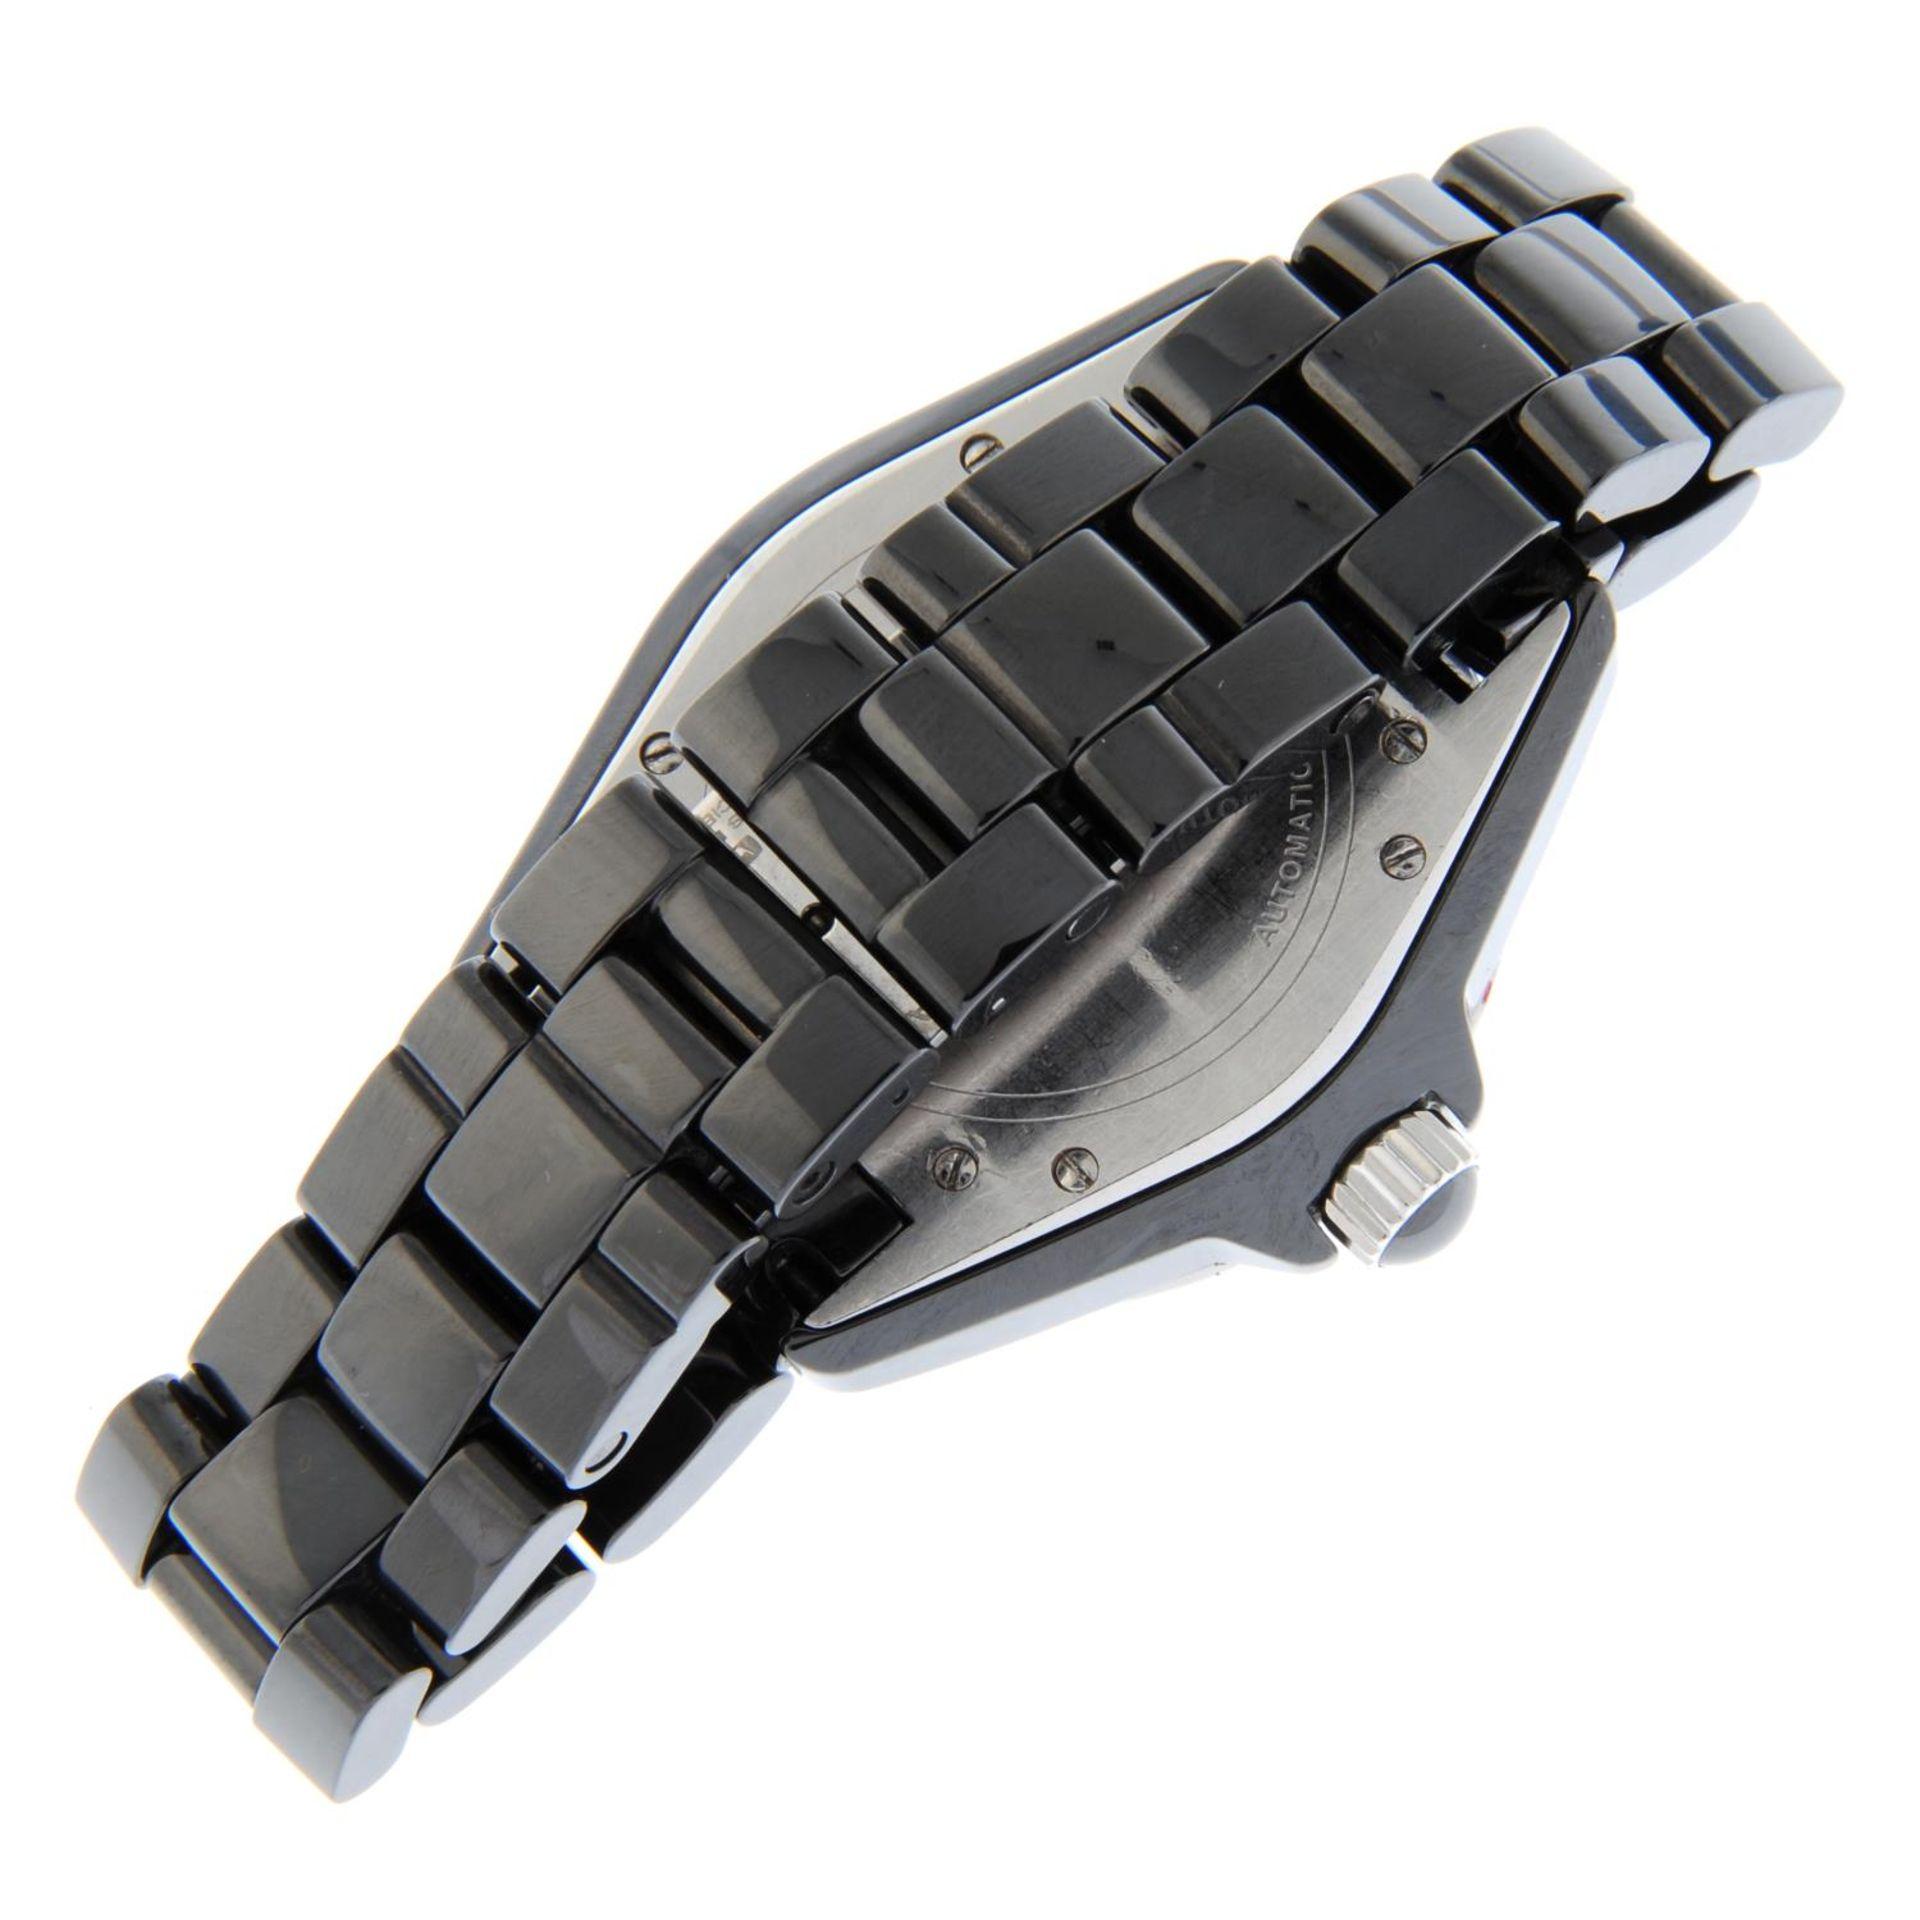 CHANEL - a J12 bracelet watch. - Bild 2 aus 5